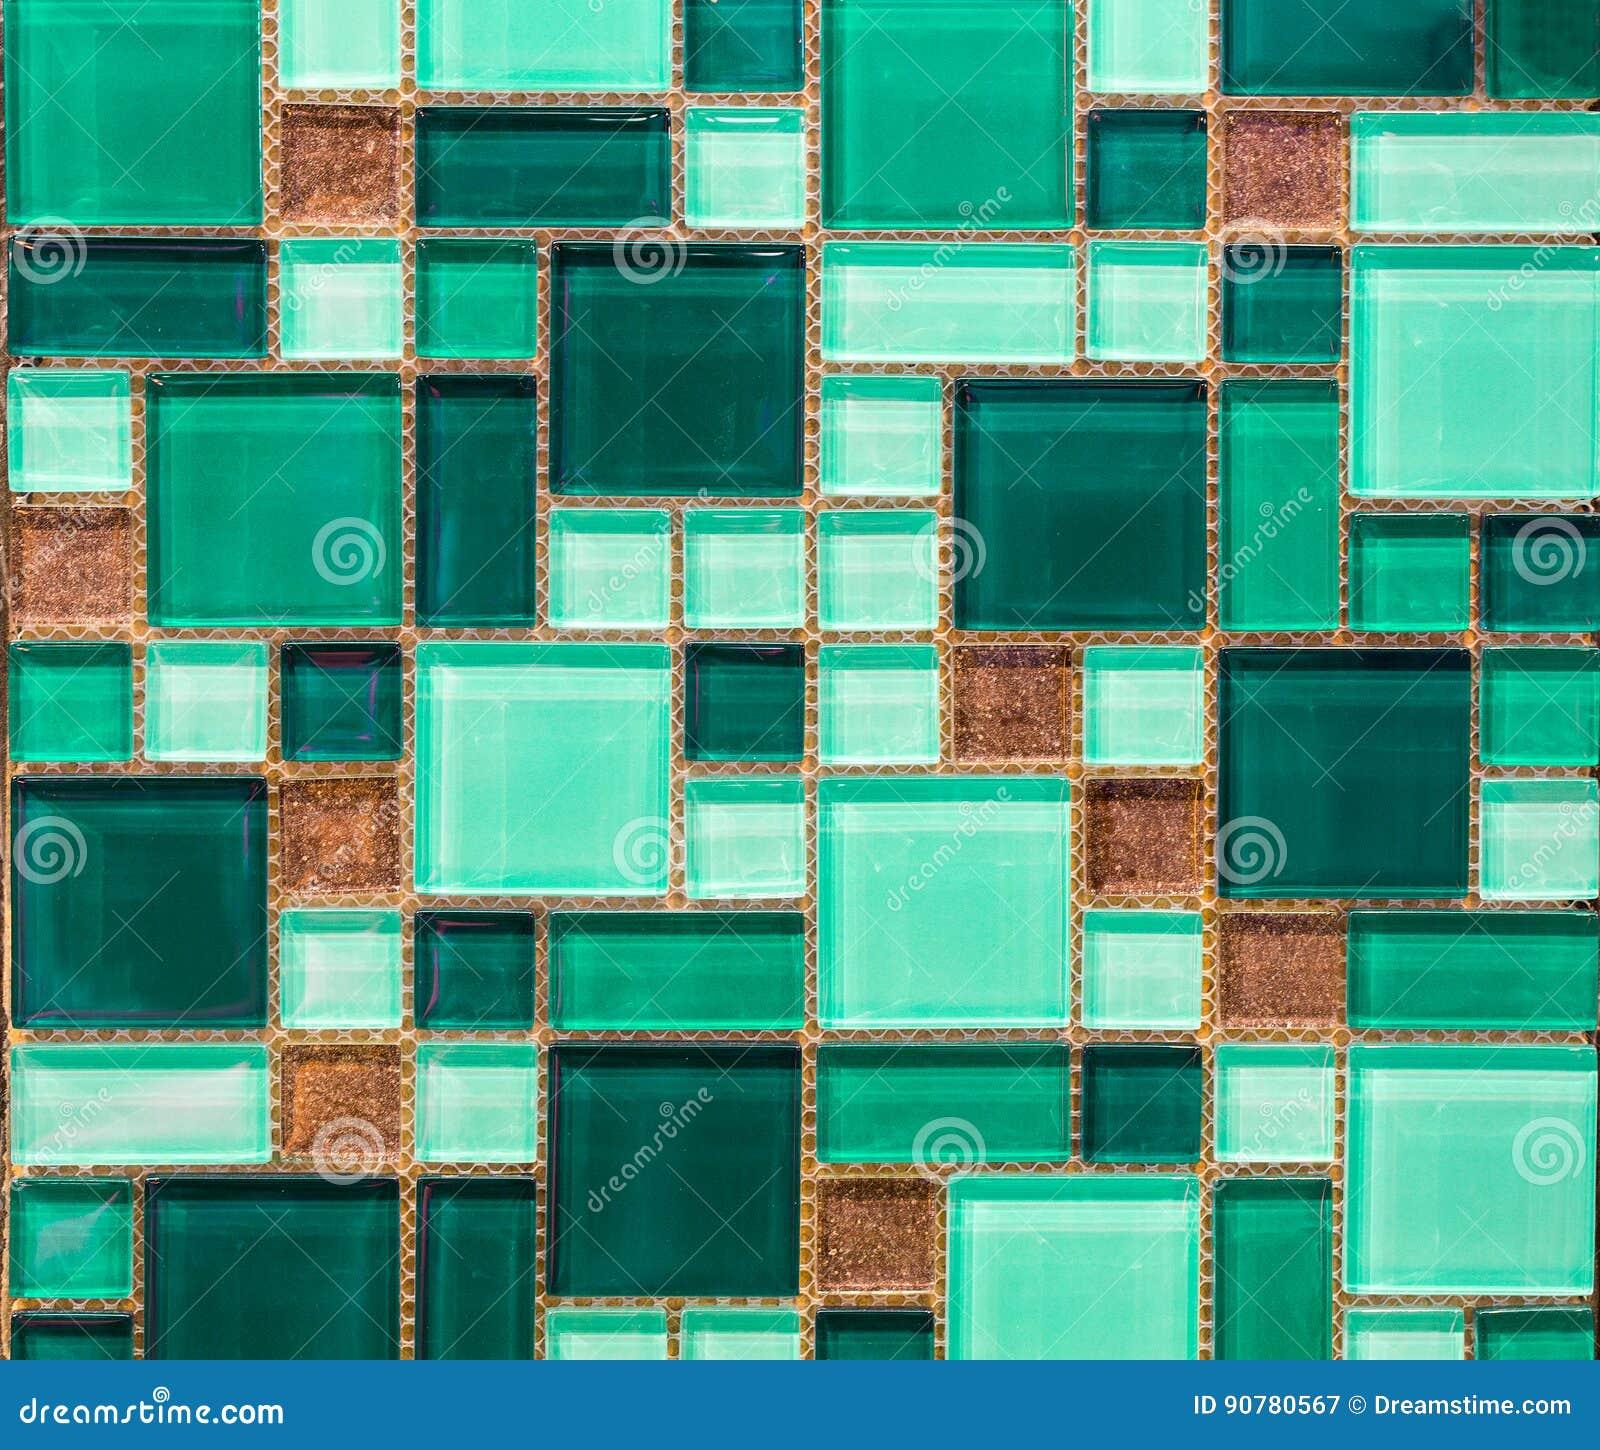 Grüne Fliese stockbild. Bild von auslegung, smaragd, modern - 90780567